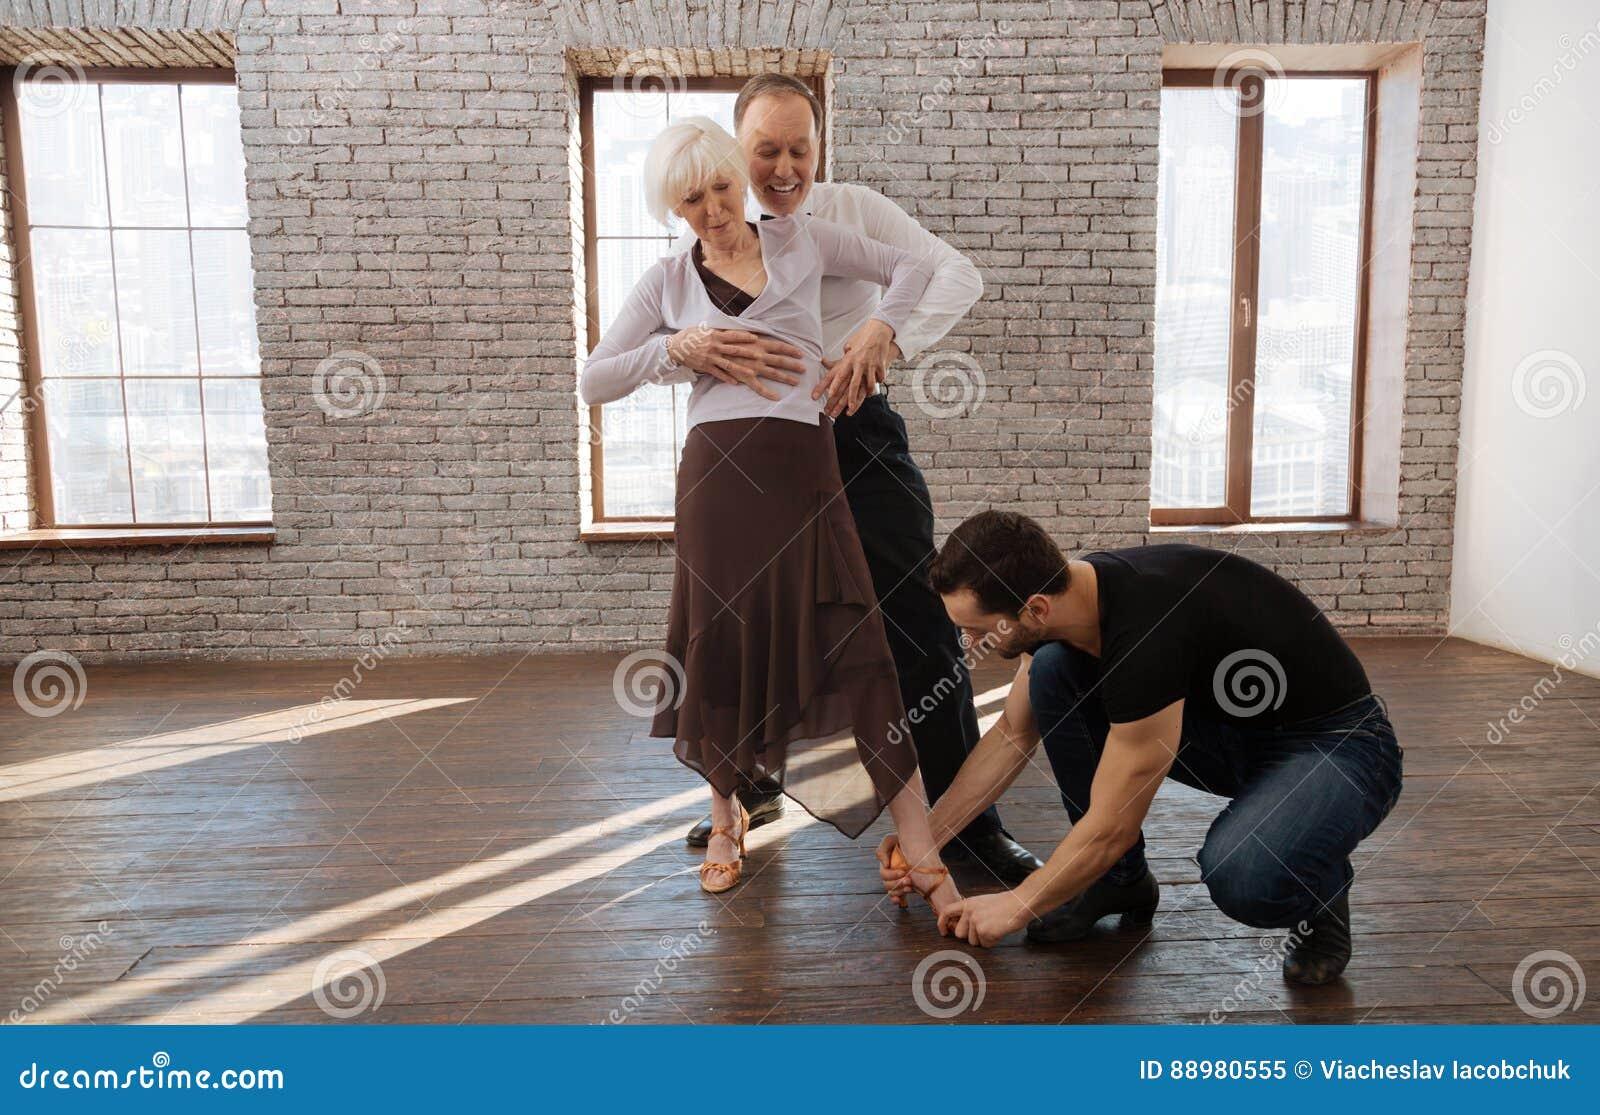 Mature dance